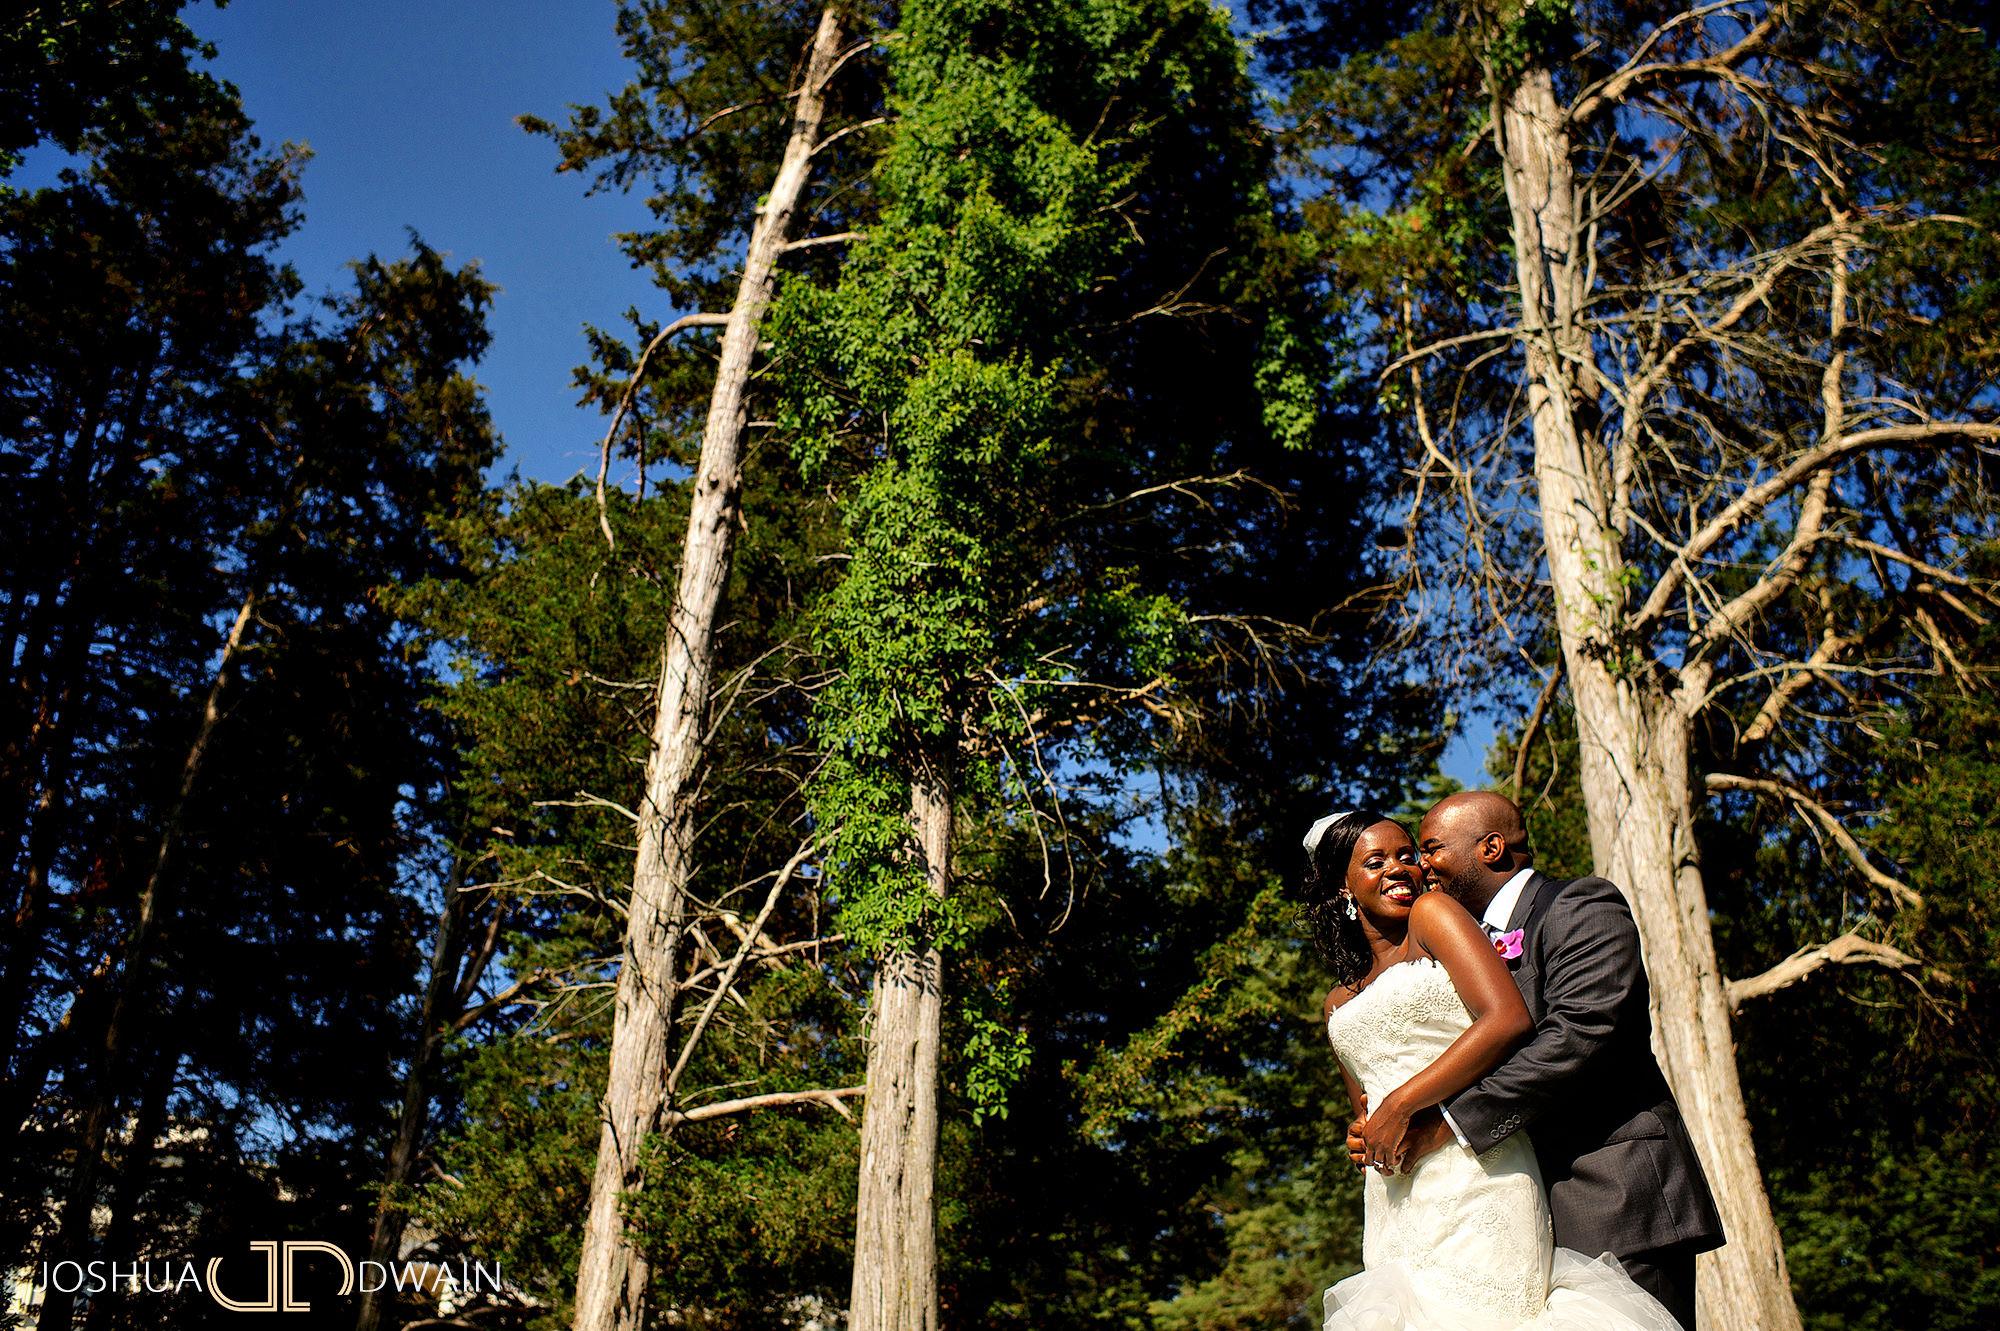 nancy-jason-006-wadsworth-estates-middletown-ct-wedding-photographer-joshua-dwain-photography-